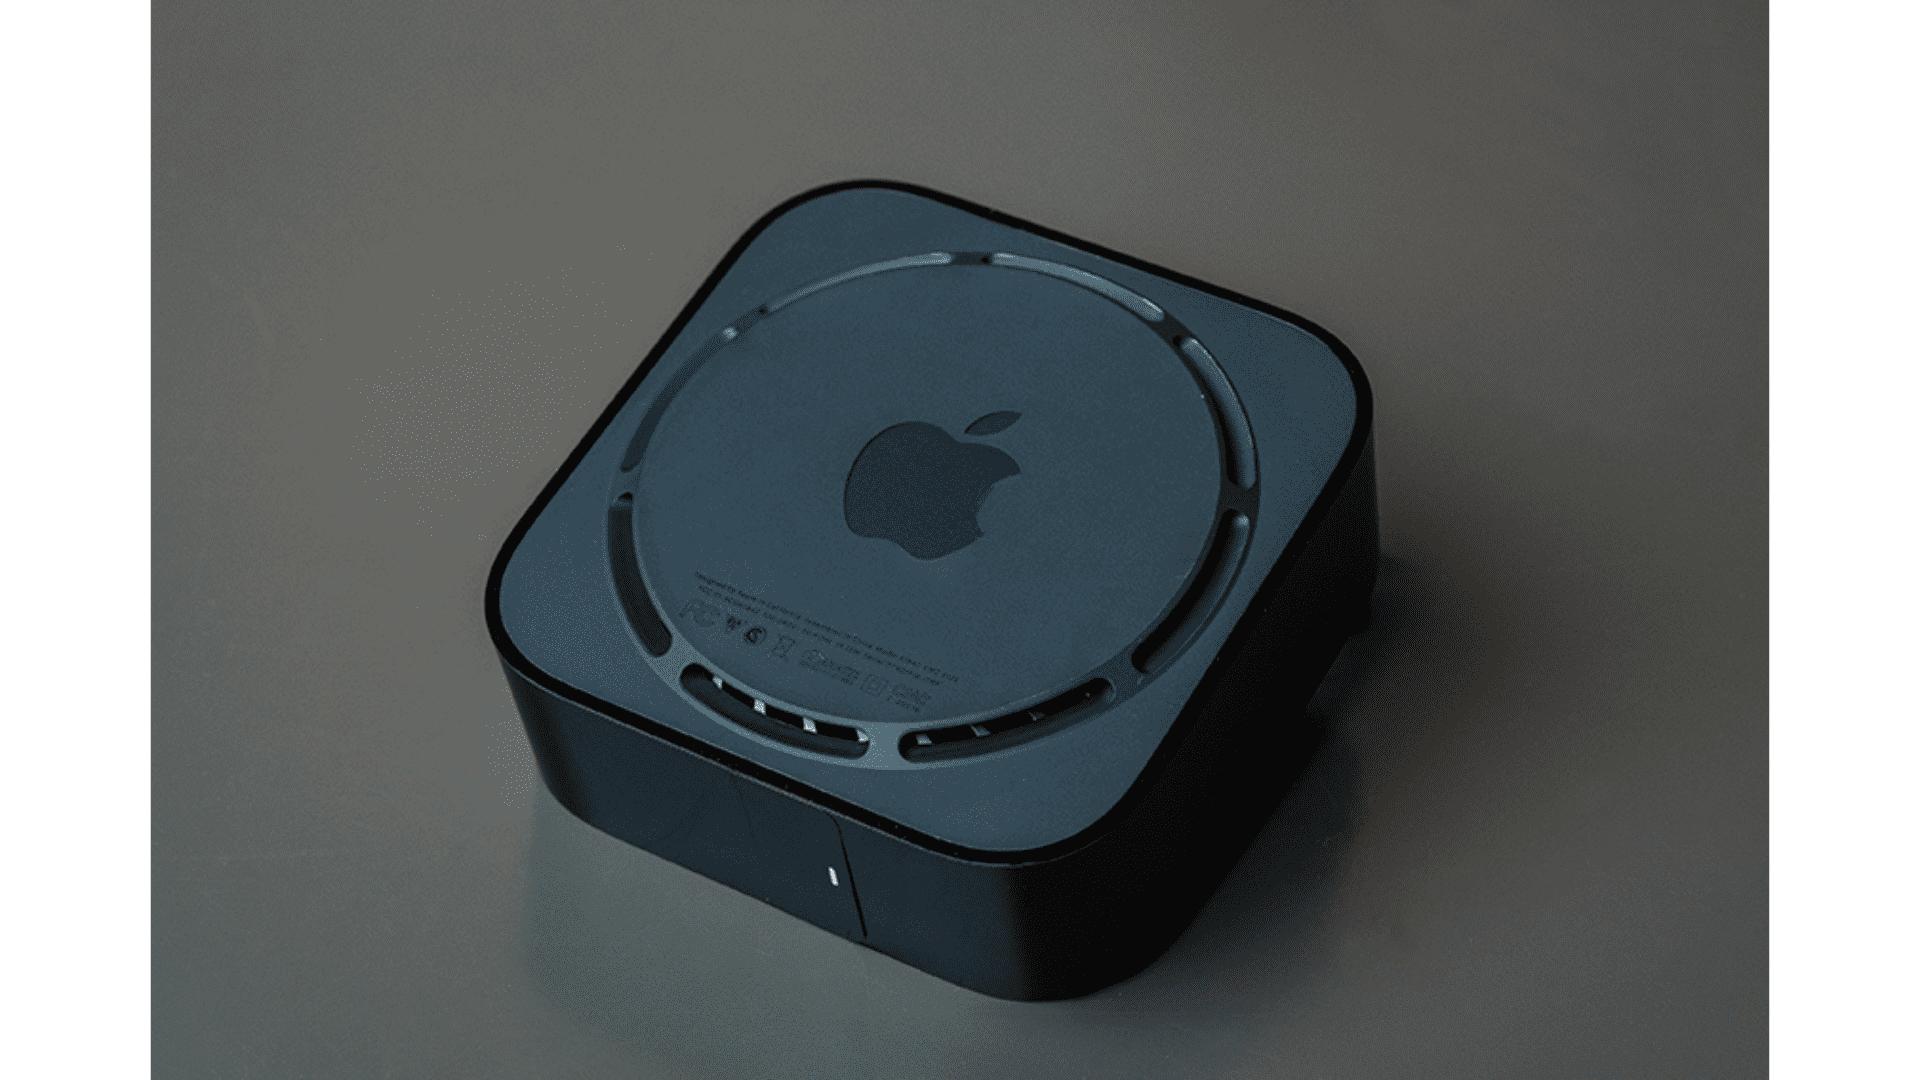 Parte debaixo da Apple TV 4K. (Foto: Zoom)